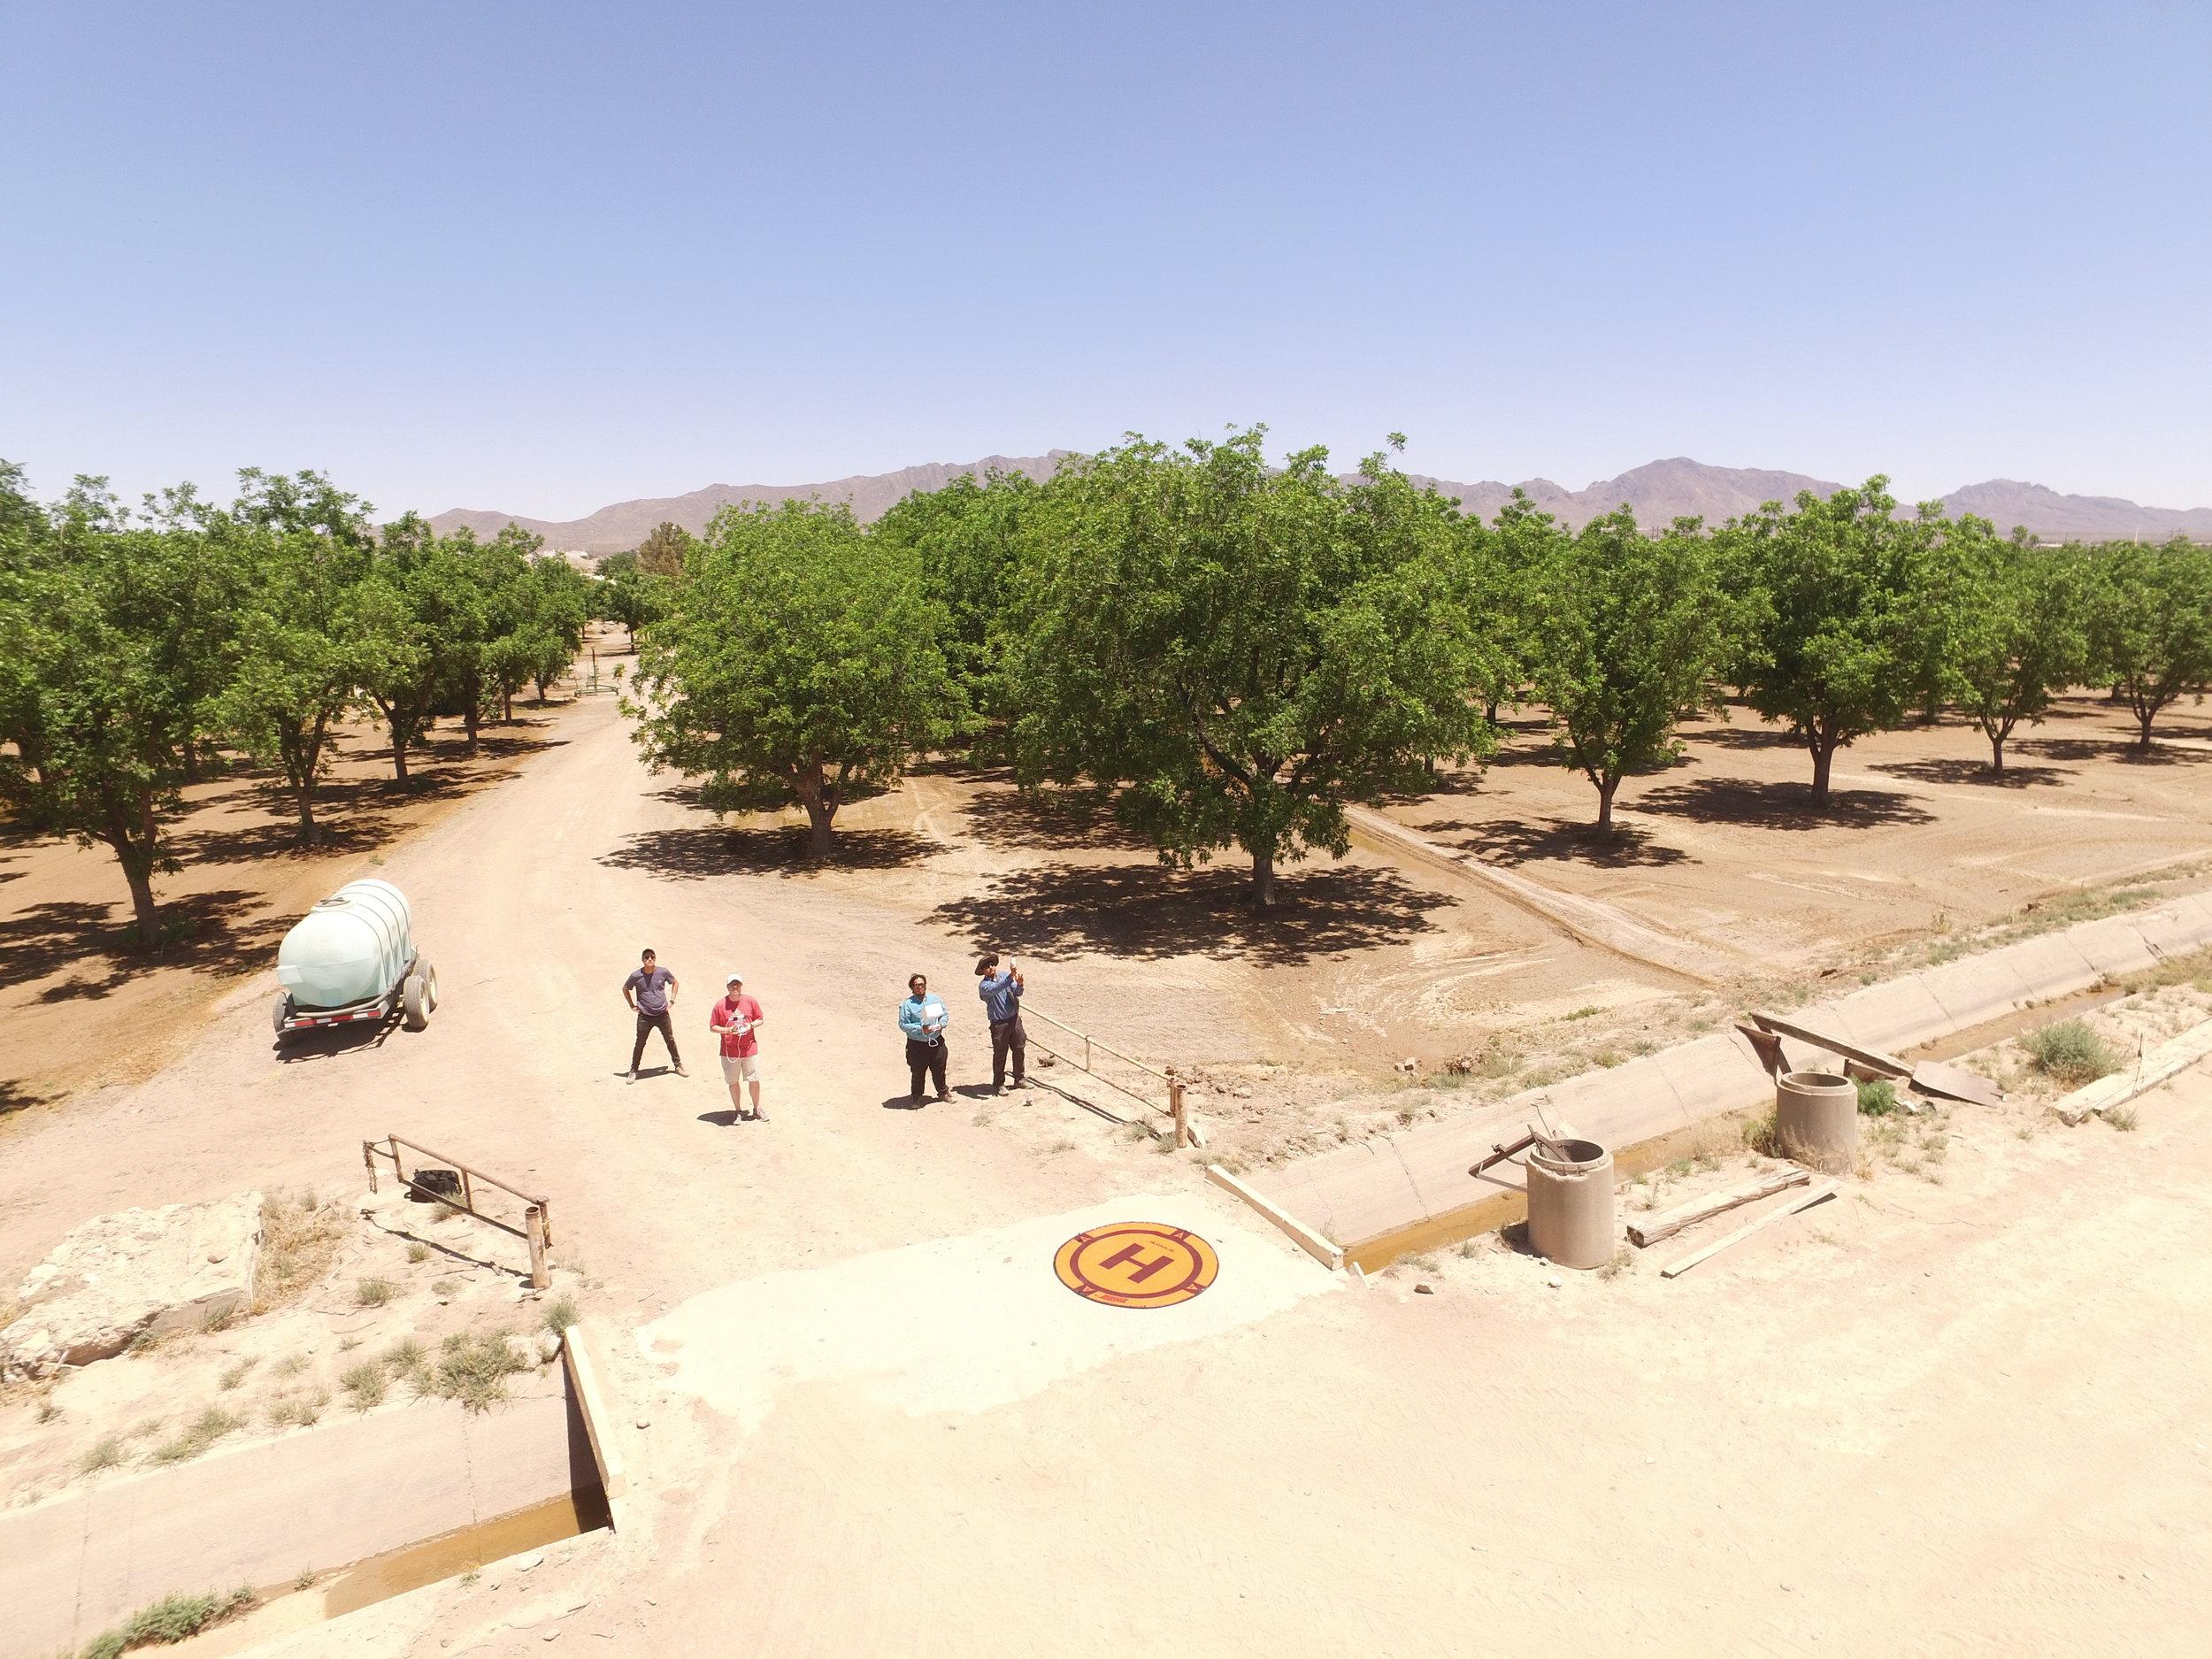 Drone flight at flood-irrigated pecan farm (el paso, tx)